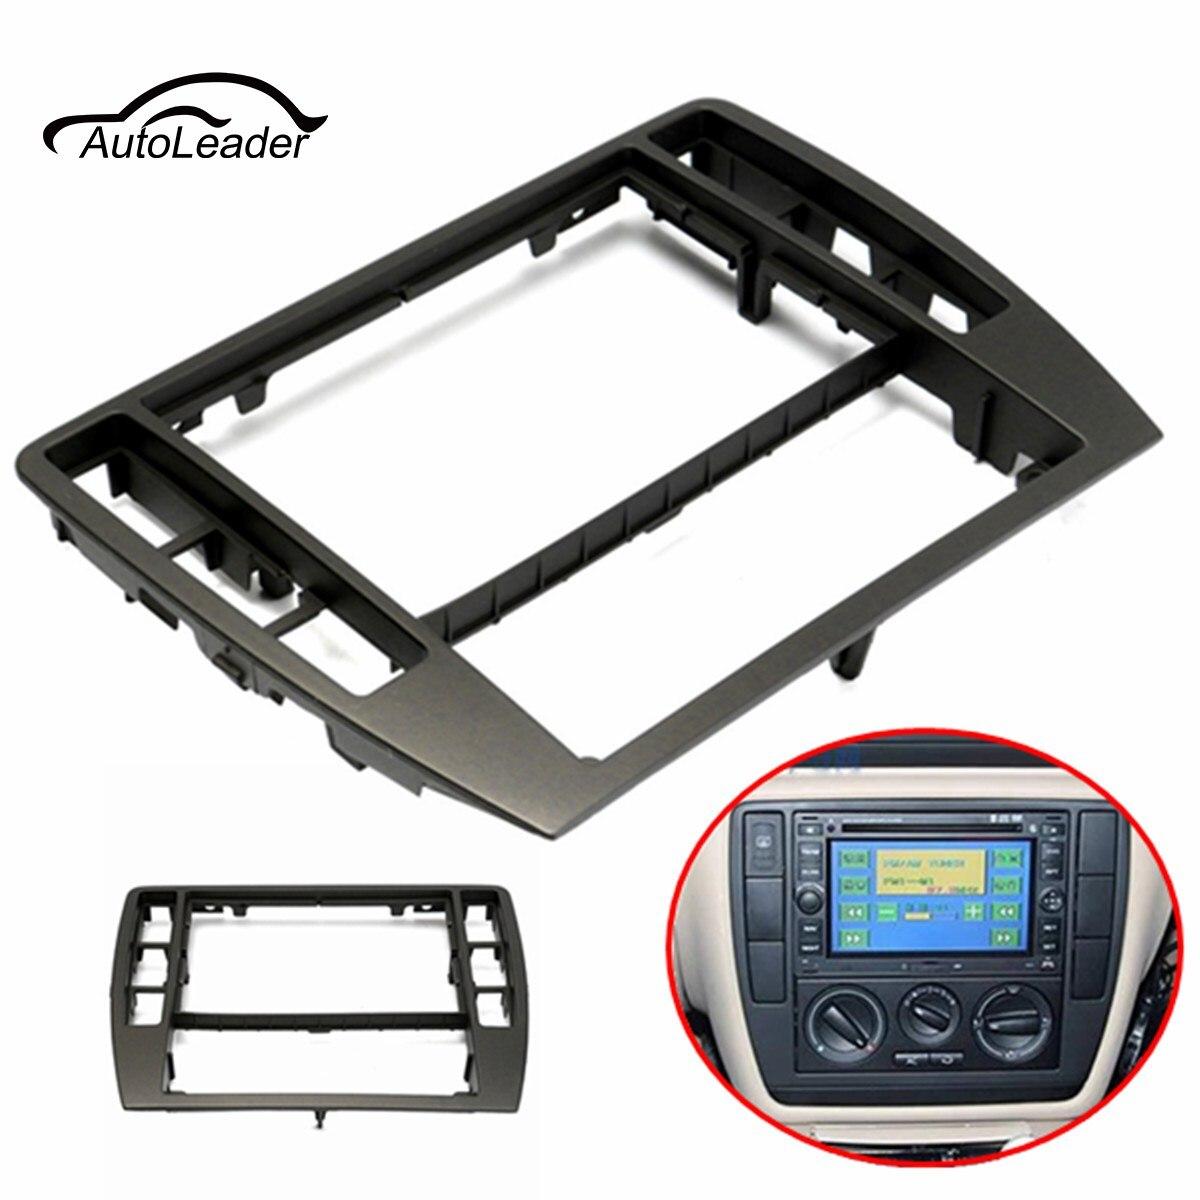 OEM: 3B0858069 New ABS Interior Dash Center Console Trim Bezel Panel Radio Face Frame for VW PASSAT B5 2001 2002 2003 2004 2005